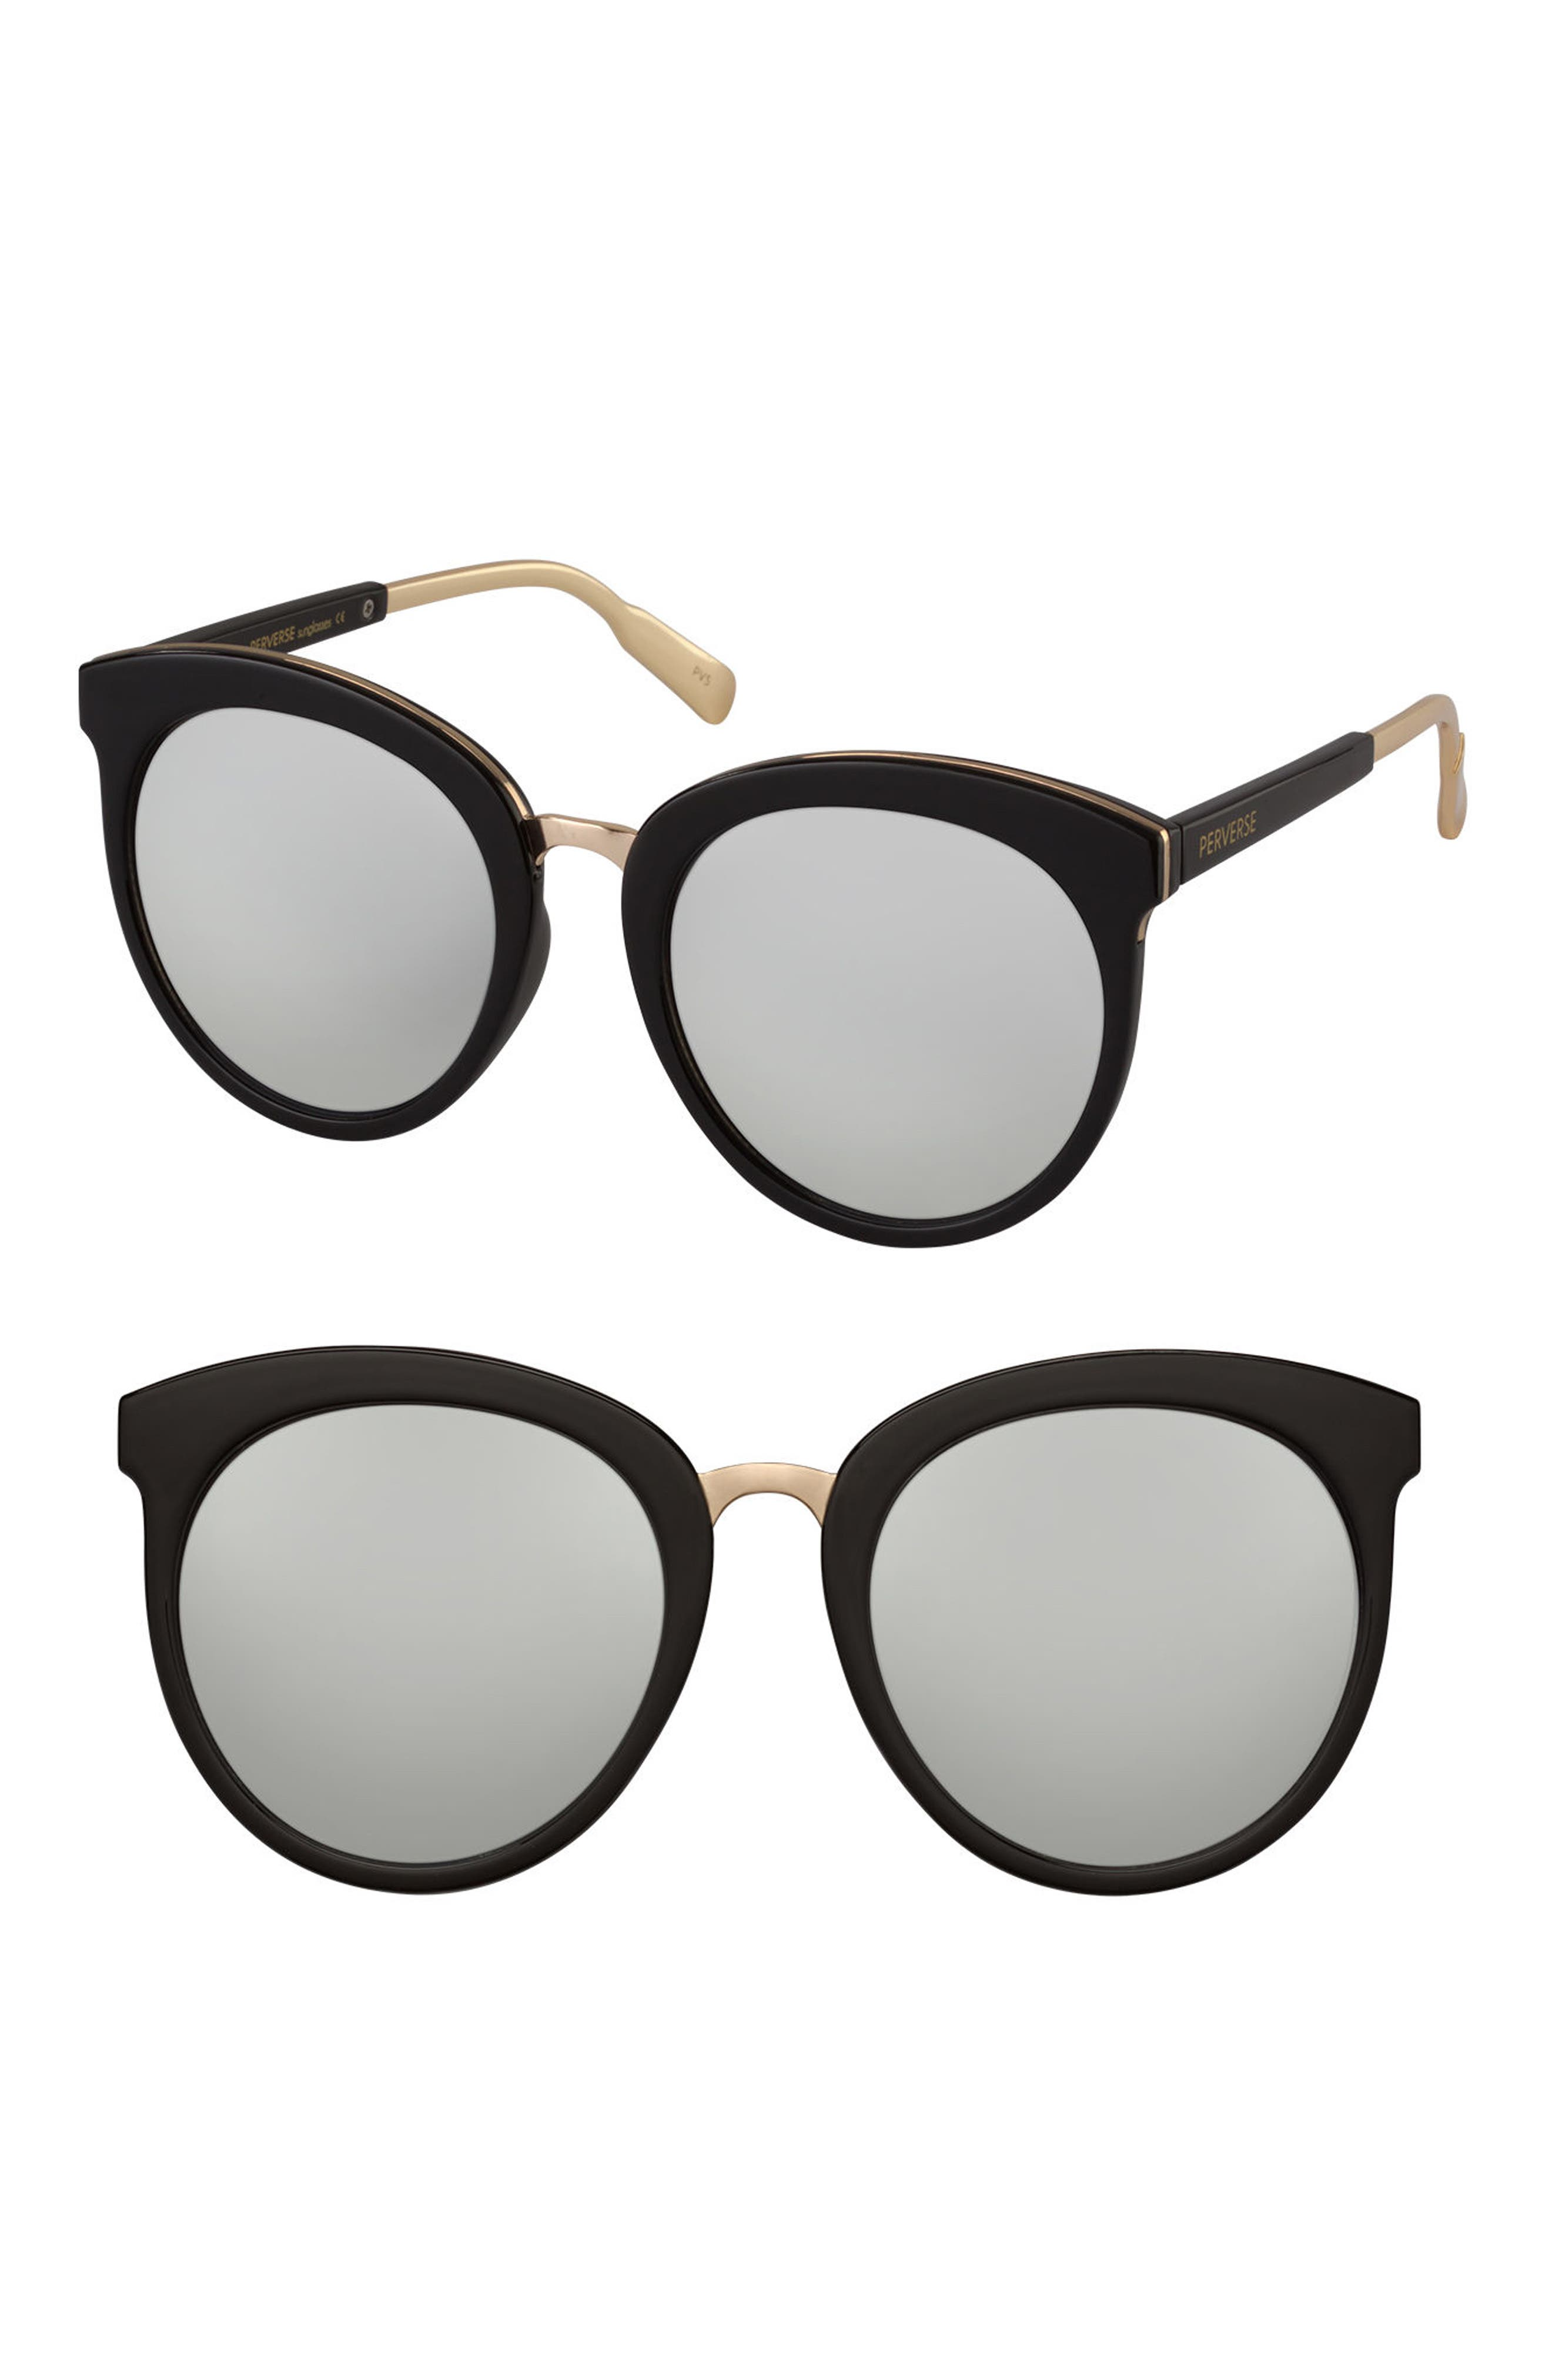 PERVERSE Luxe Sunglasses